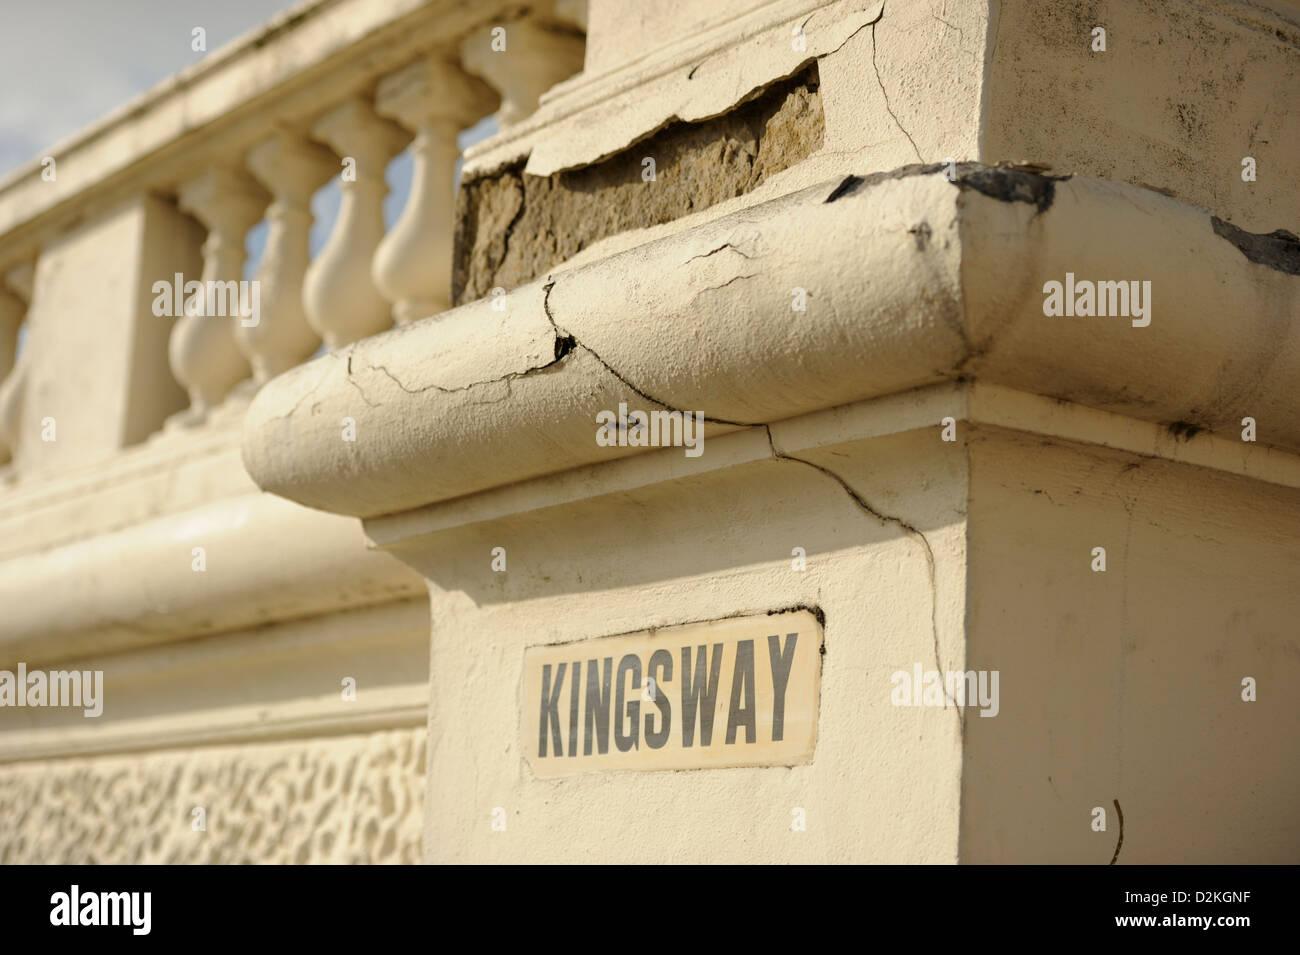 Dilapidated balustrade on Kingsway - Stock Image